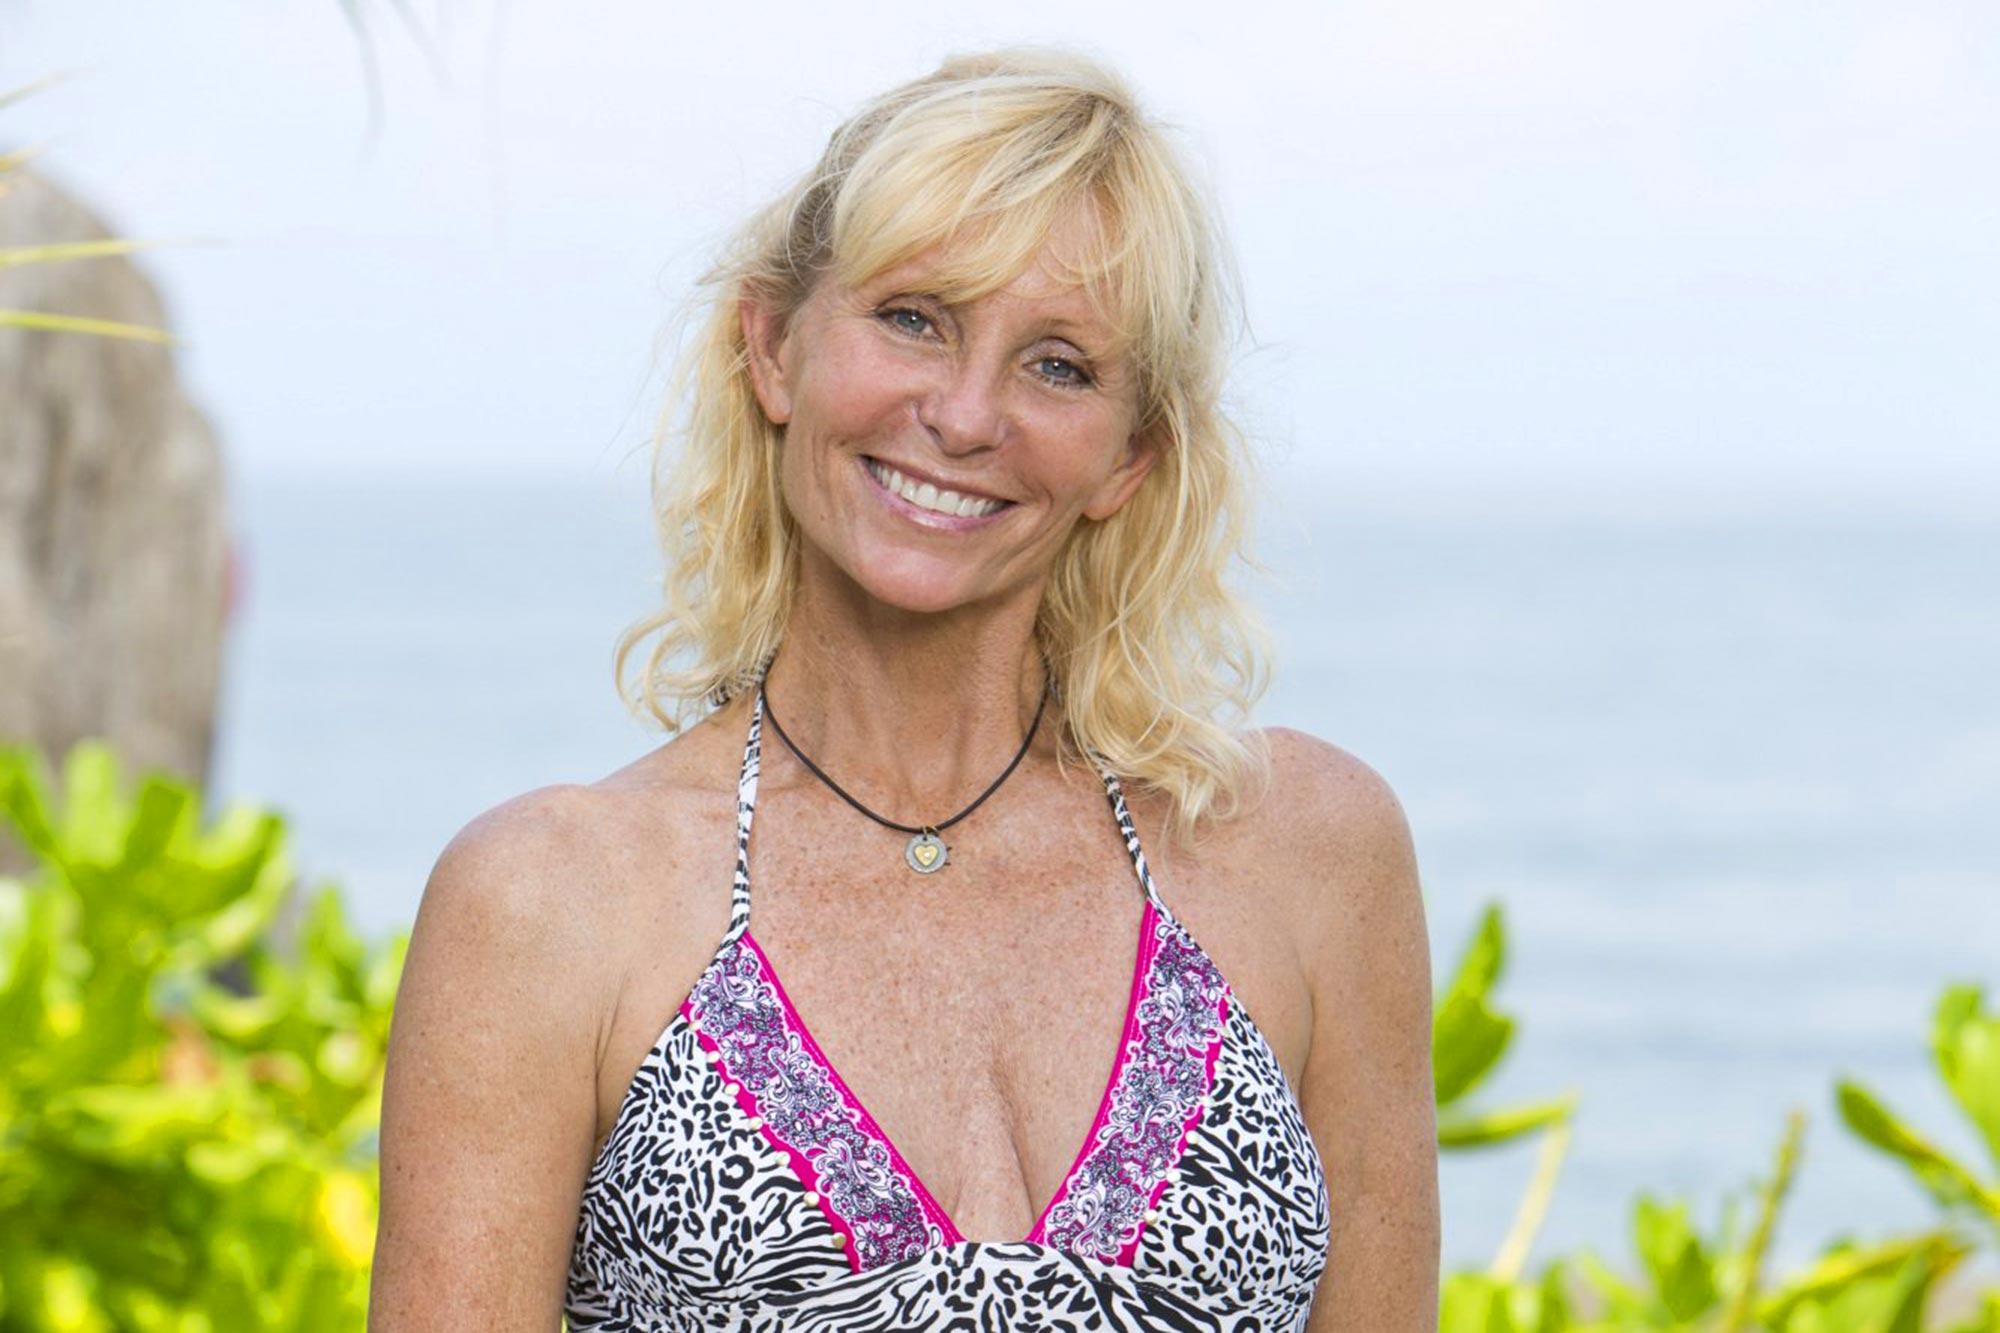 Survivor Tina Wesson